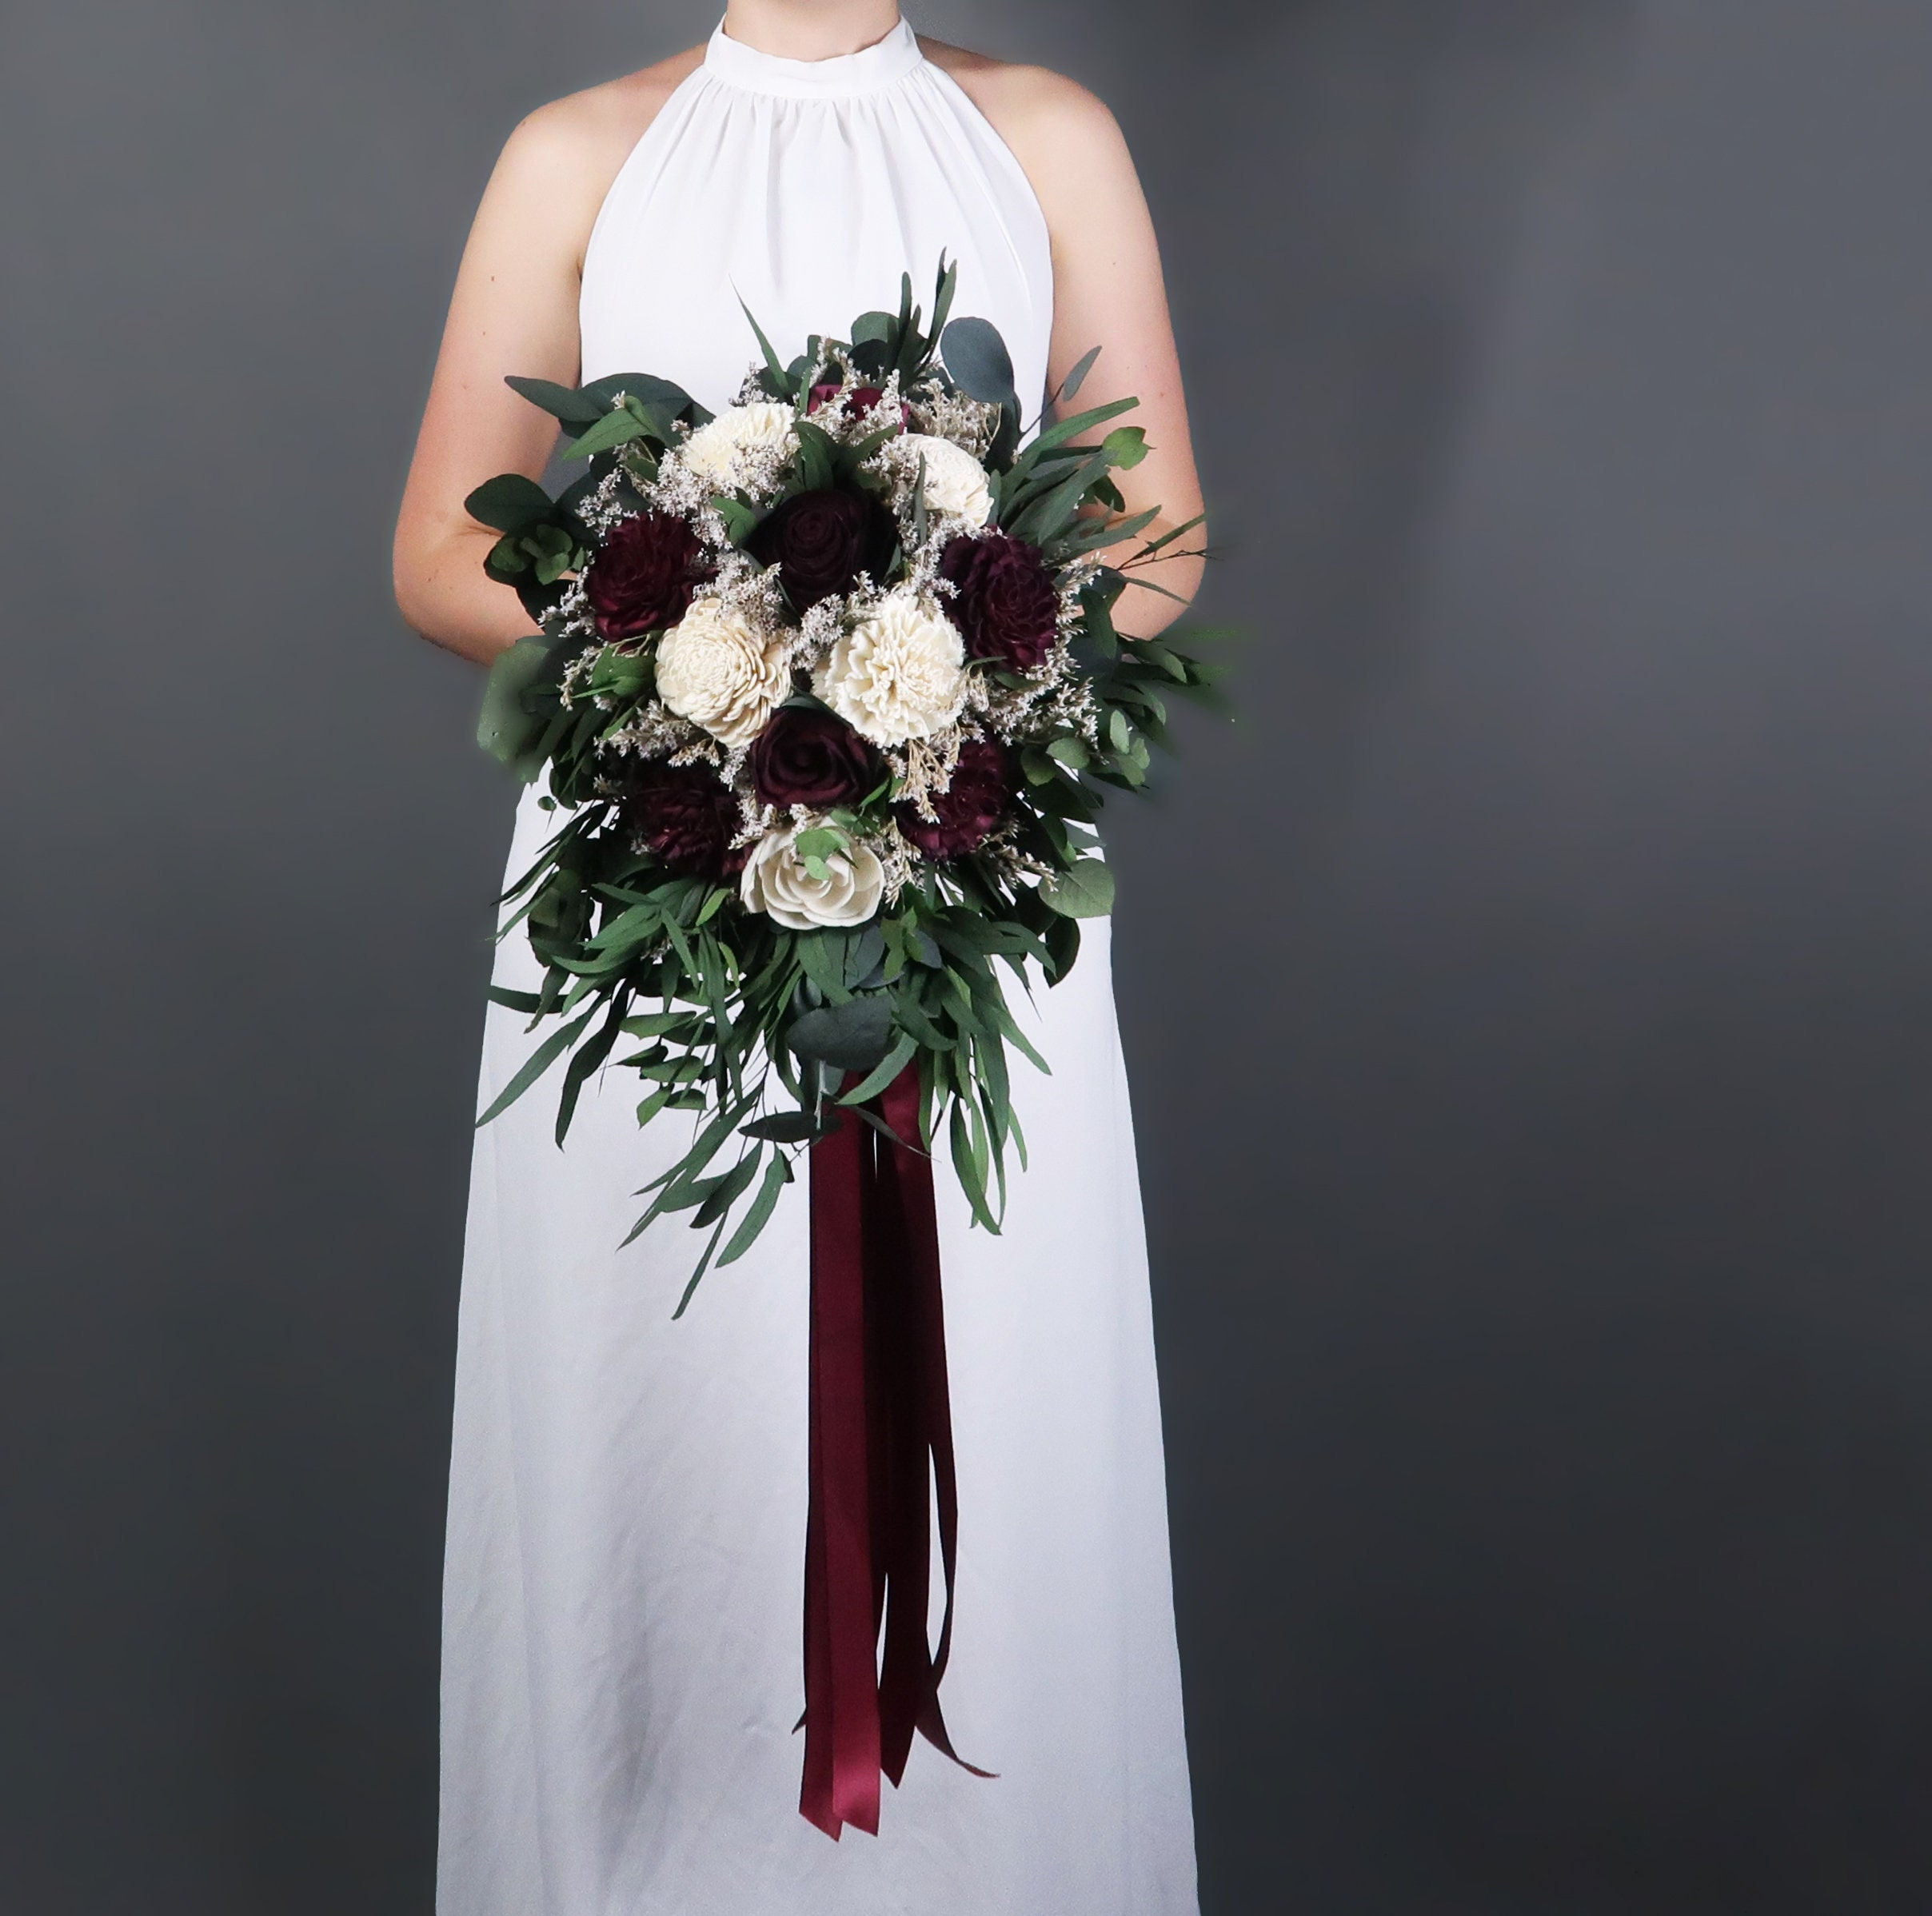 Fall Wedding Flowers List: Southwestern Boho Wedding Bouquet Preserved Eucalyptus